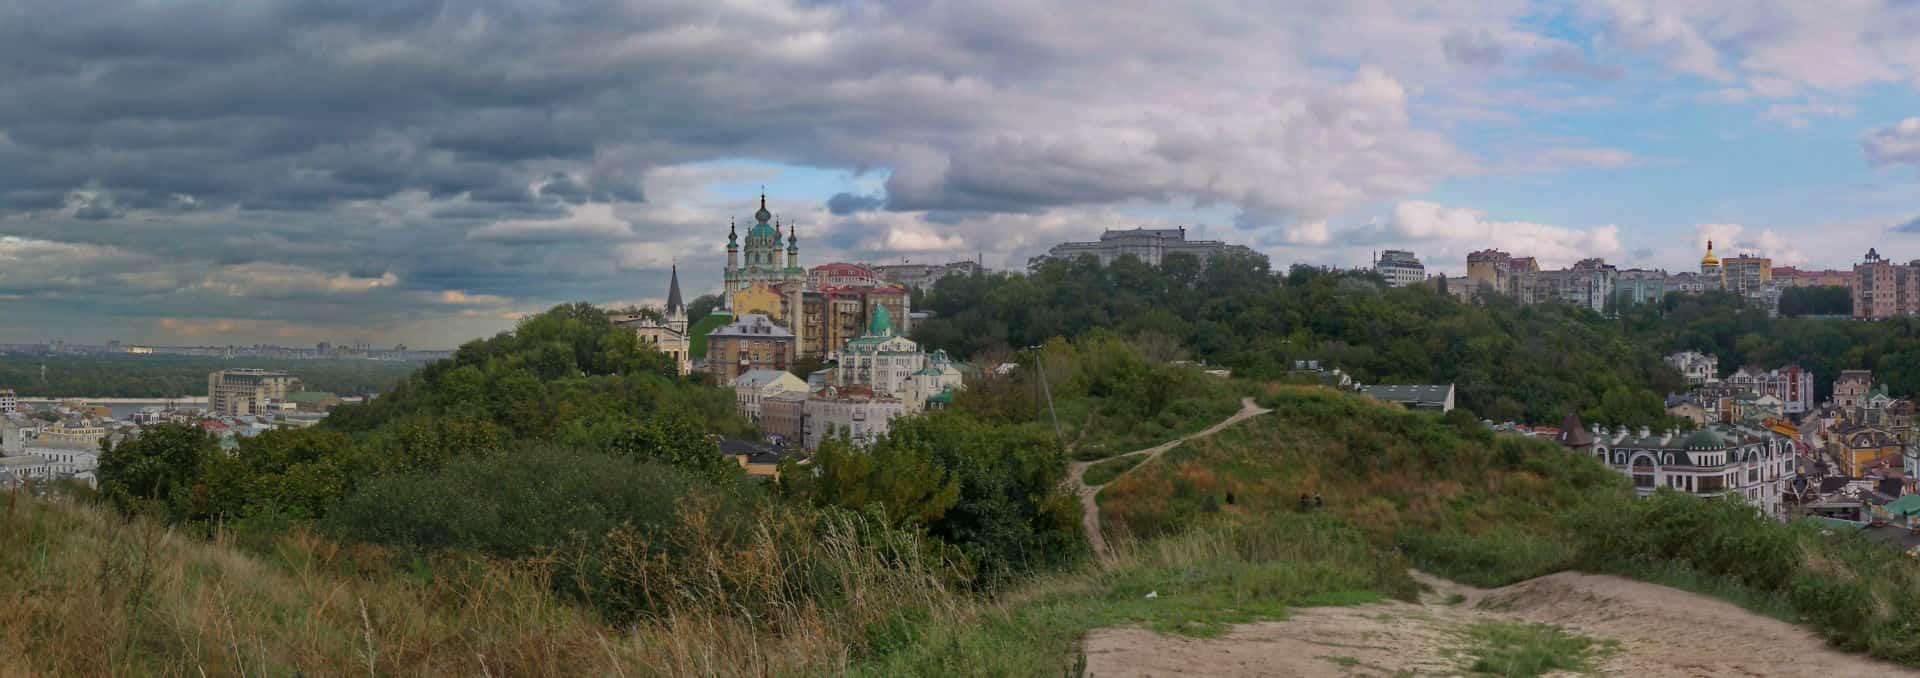 Zamkova Hill view